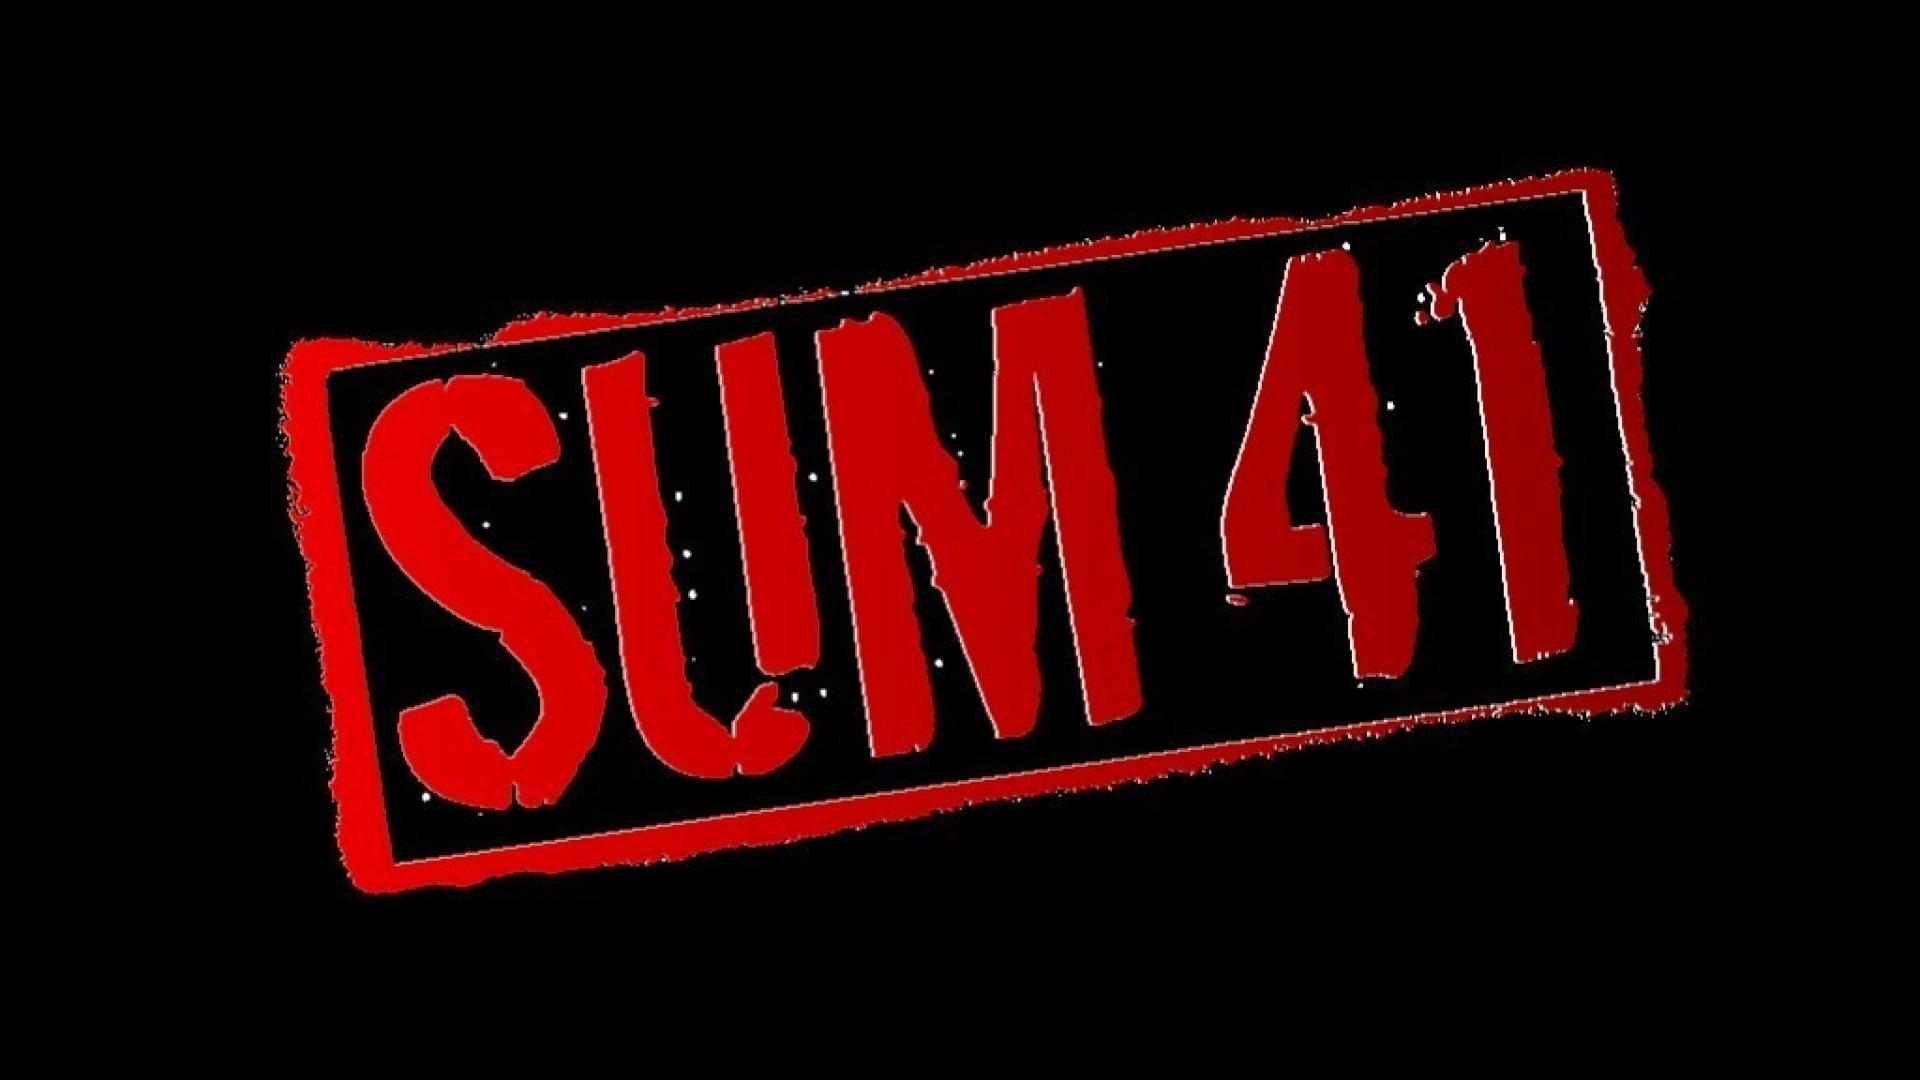 music sum 41 wallpaper | (78557)